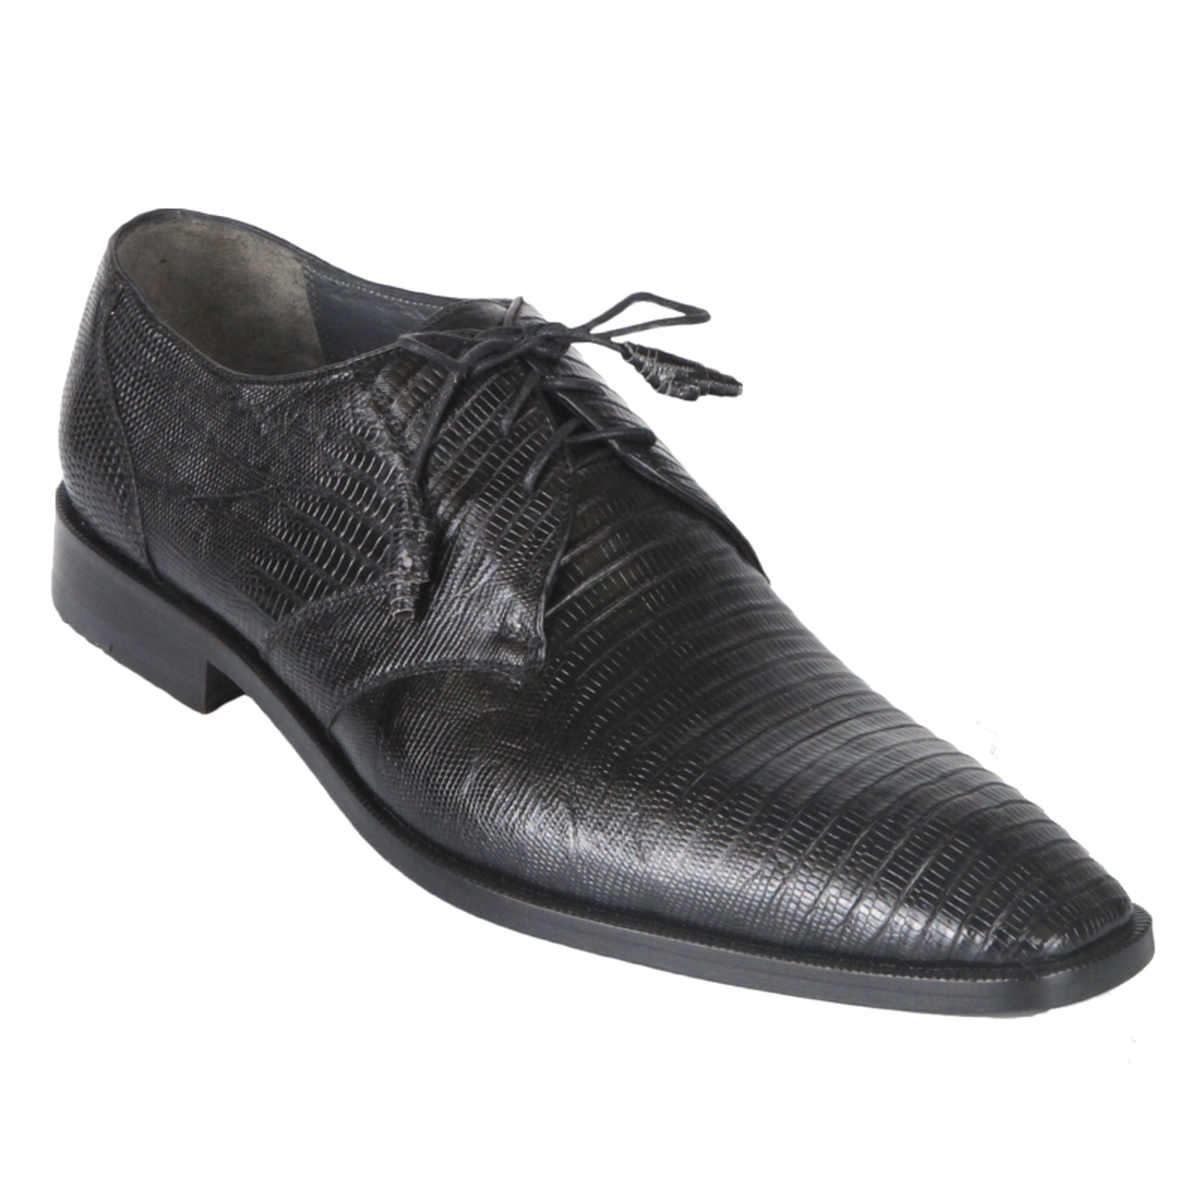 Los Altos Black Lizard Skin Plain Toe Shoes ZV080705